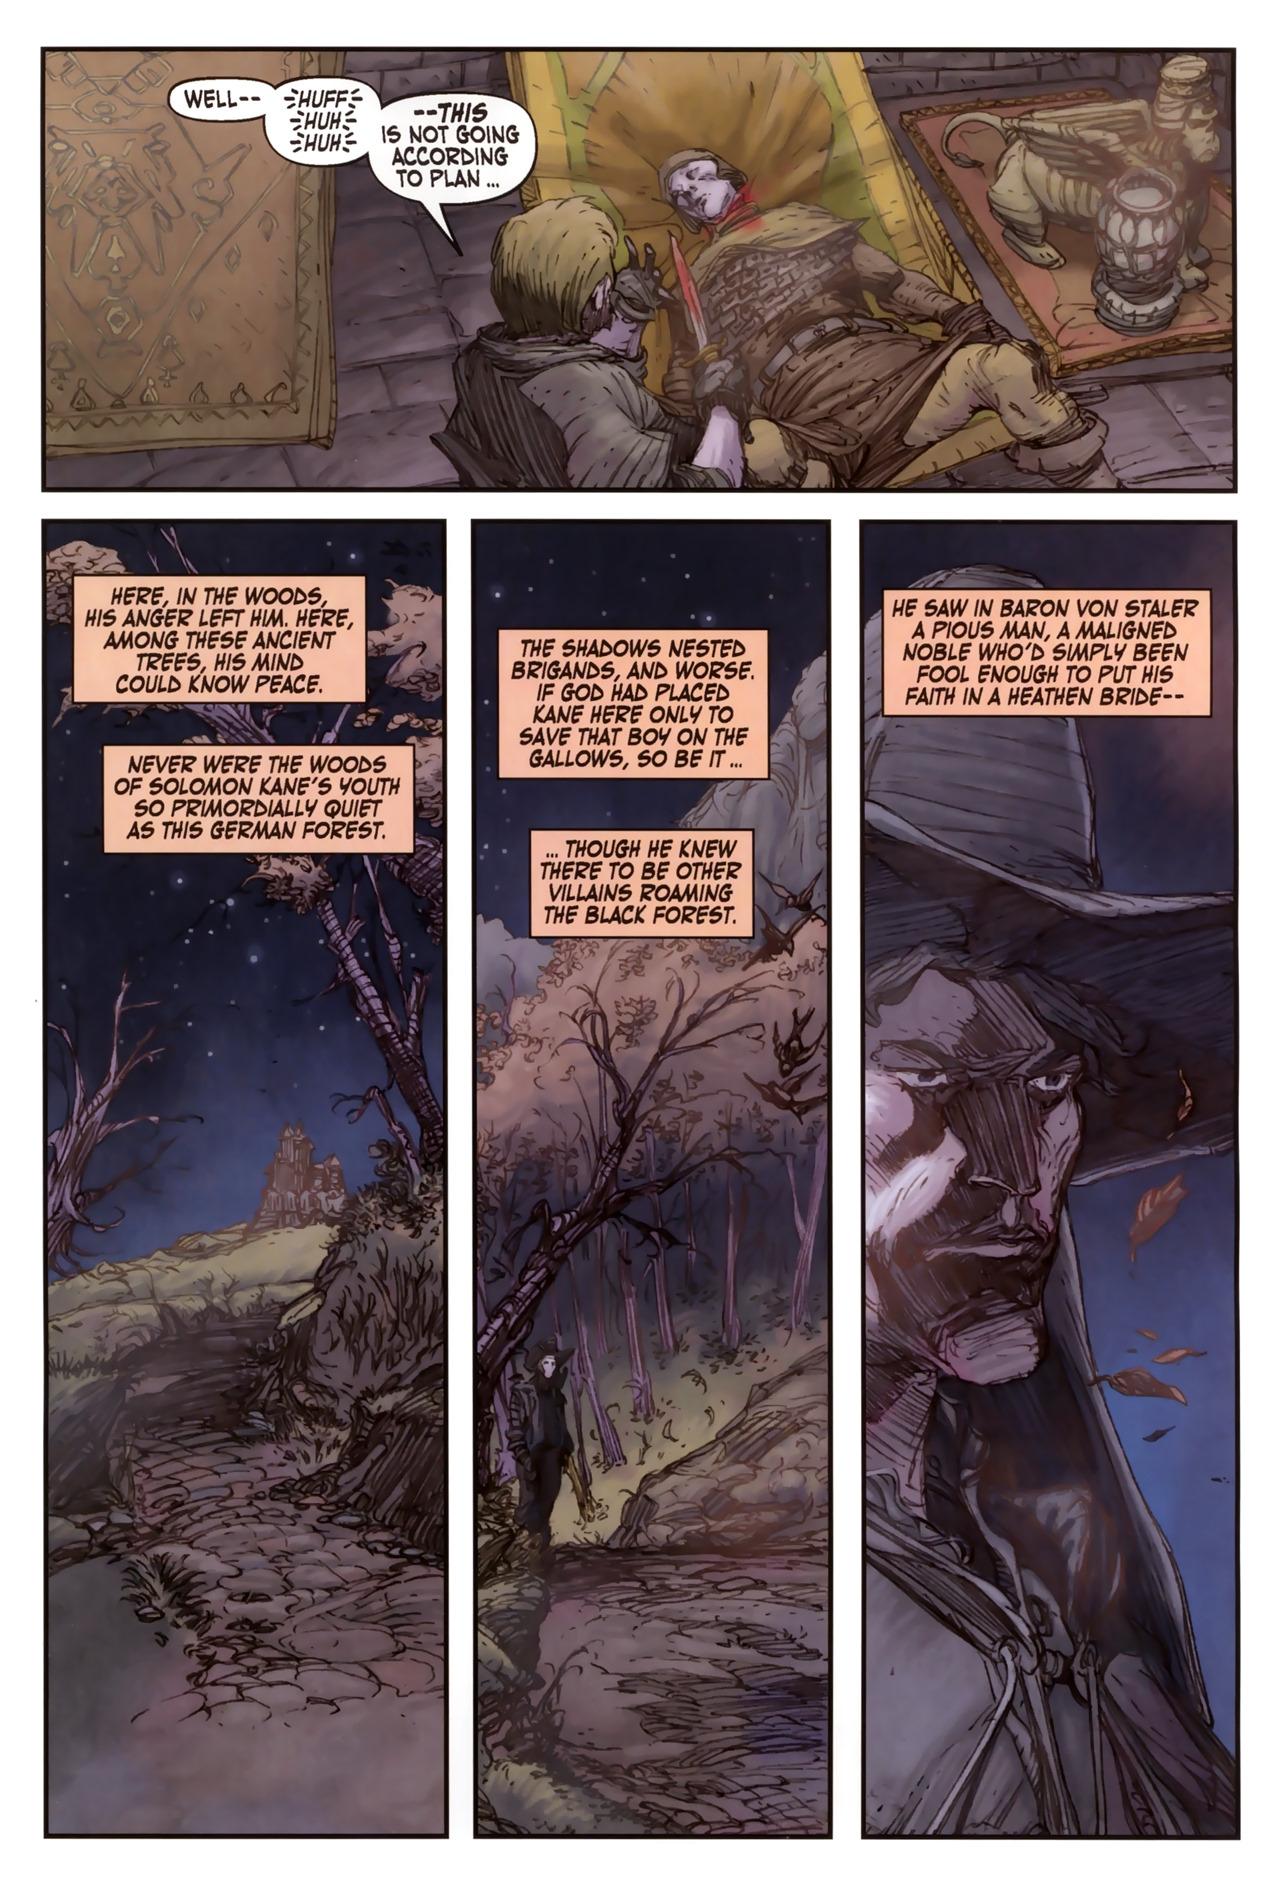 Read online Solomon Kane comic -  Issue #2 - 9